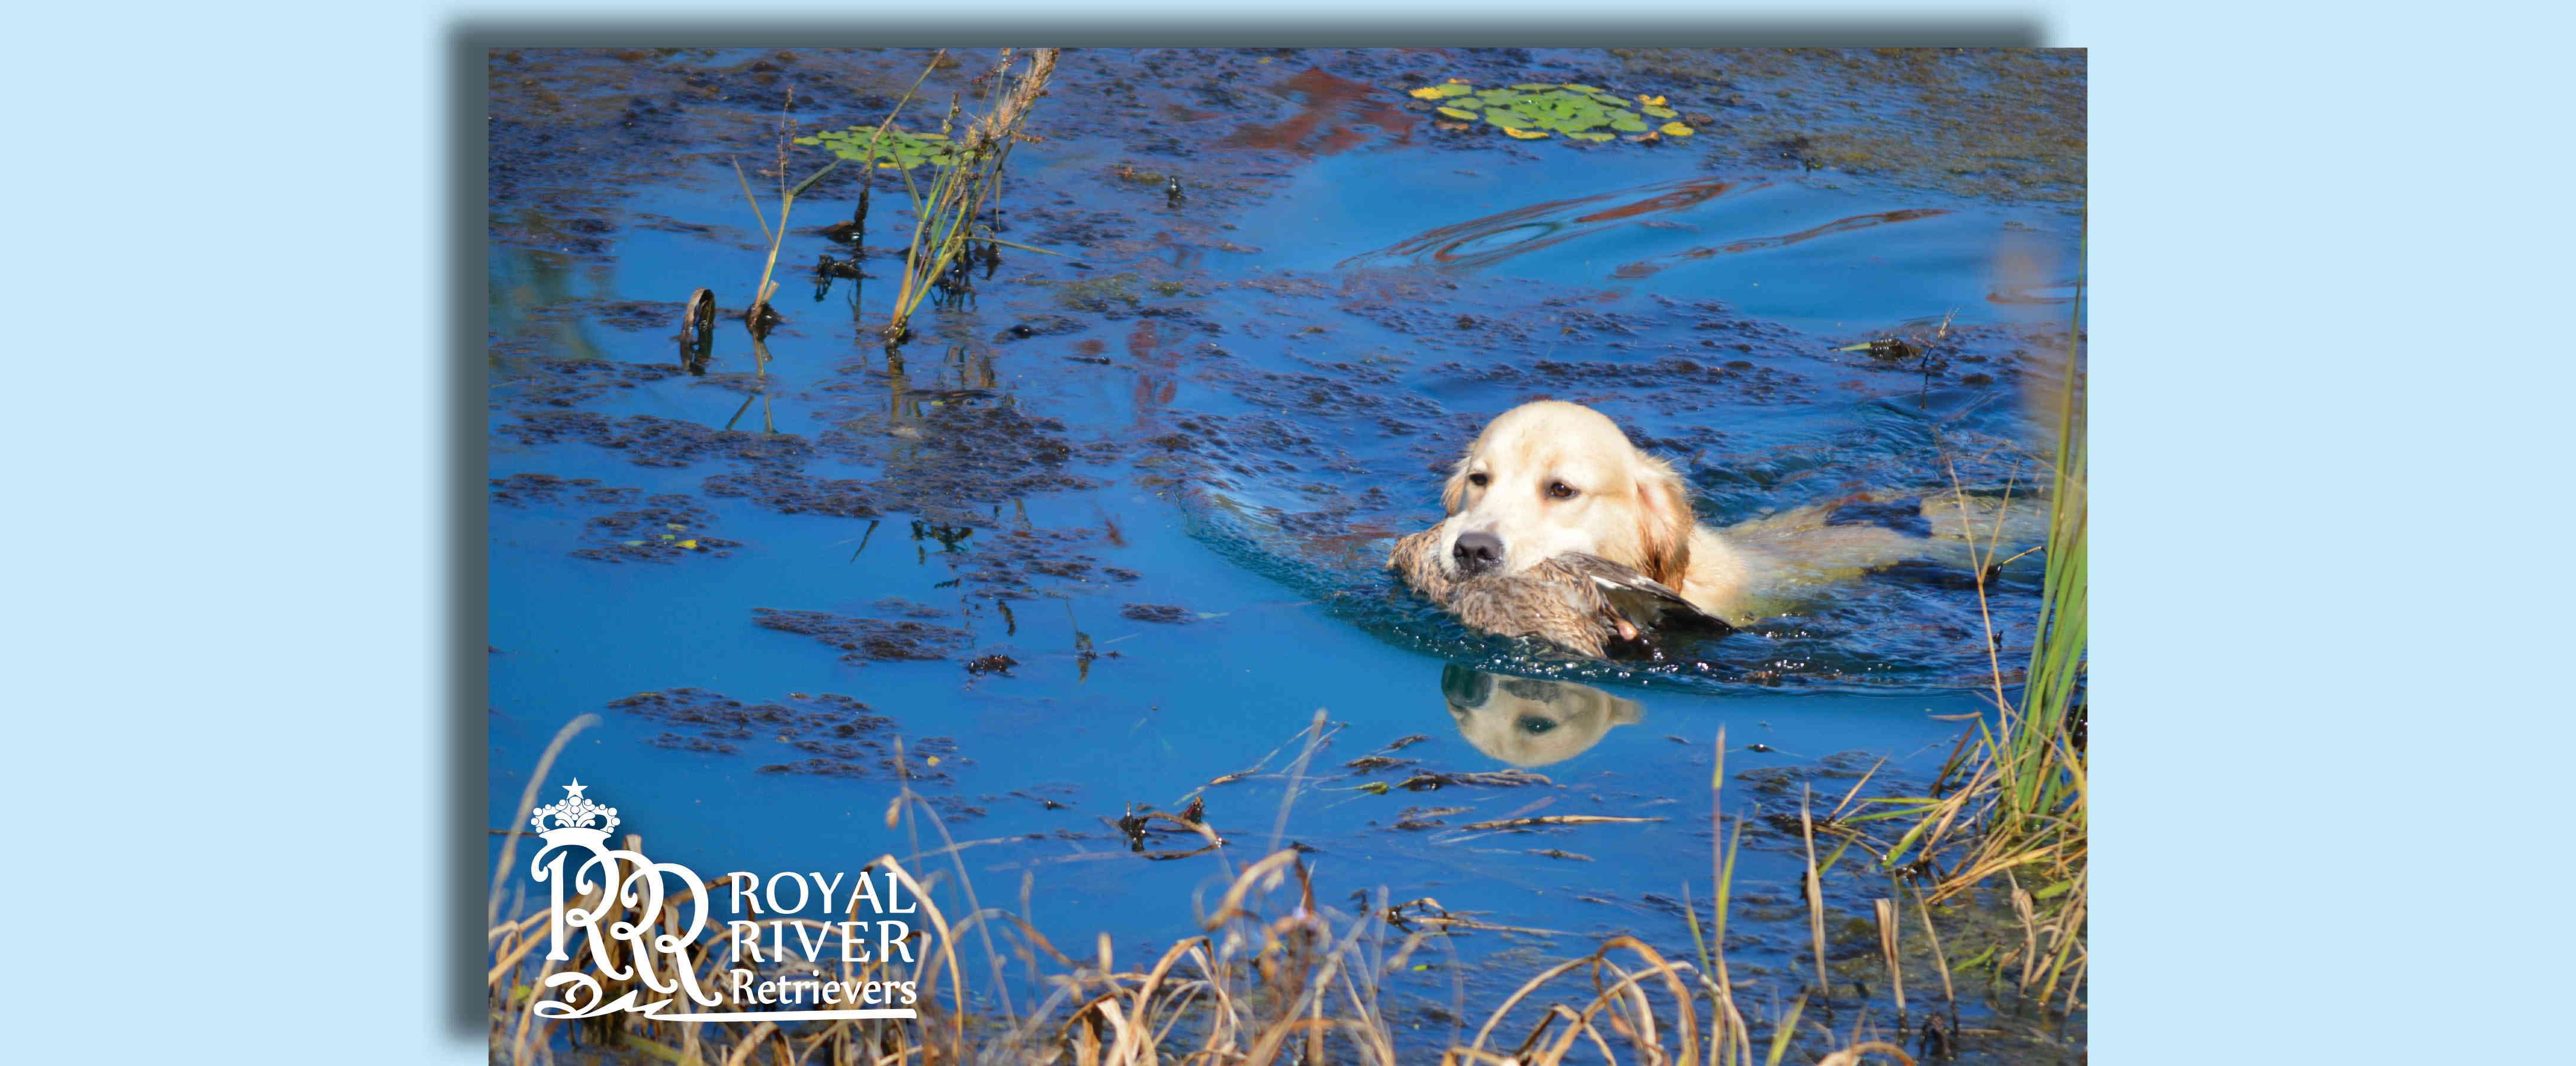 Royal River Retrievers – Golden Retriever Puppies in Maine